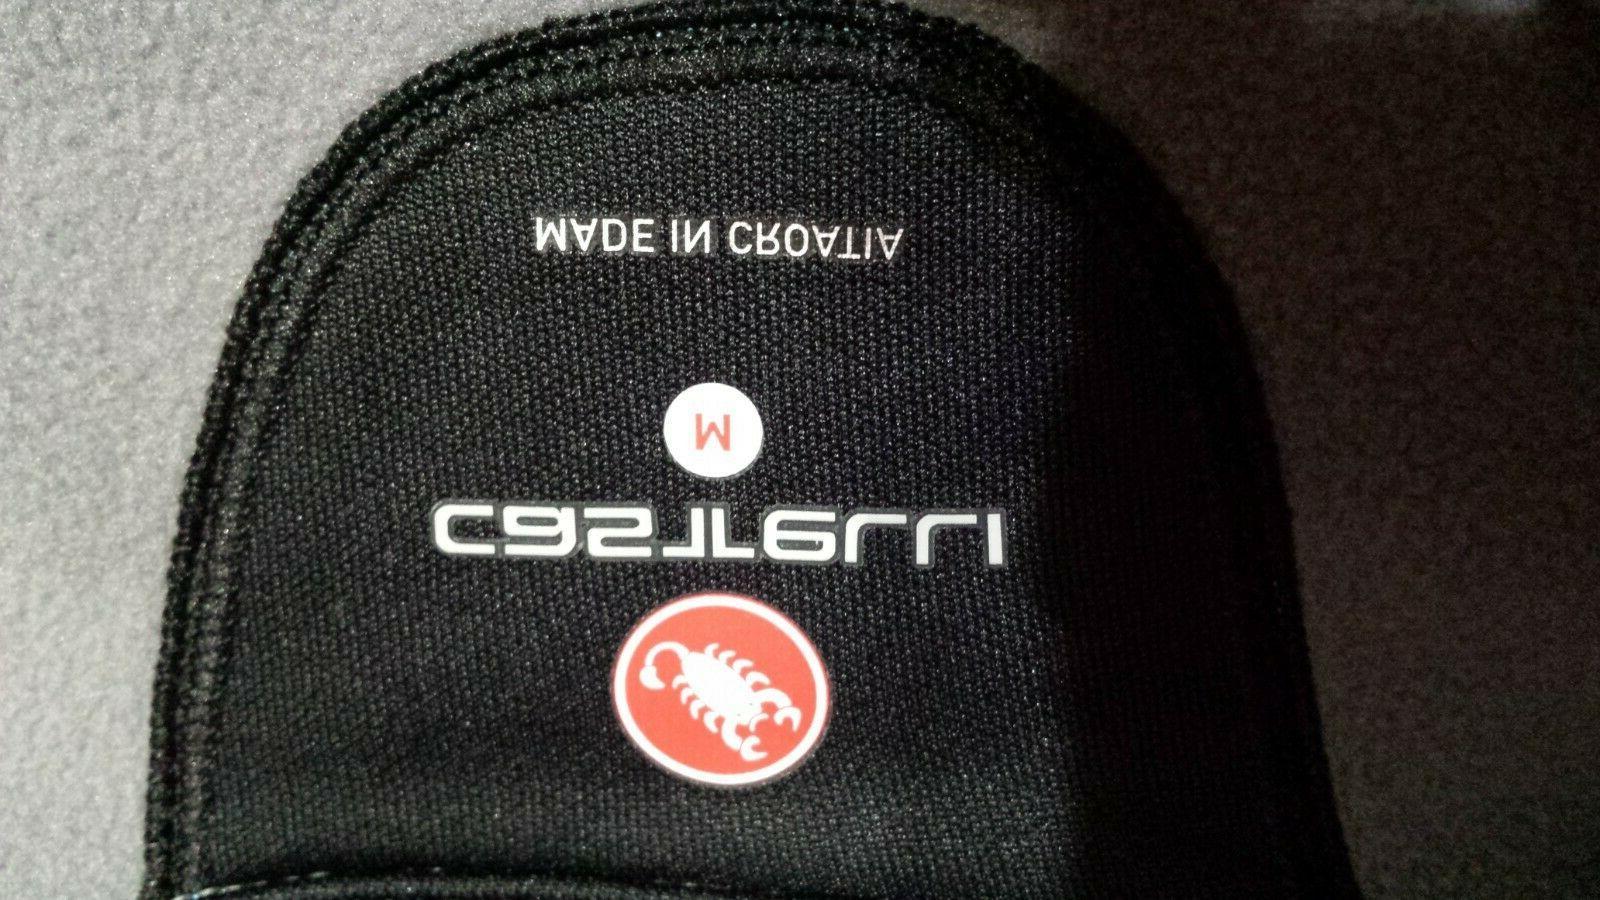 Castelli Senza 2 winter cycling biking jacket size mens